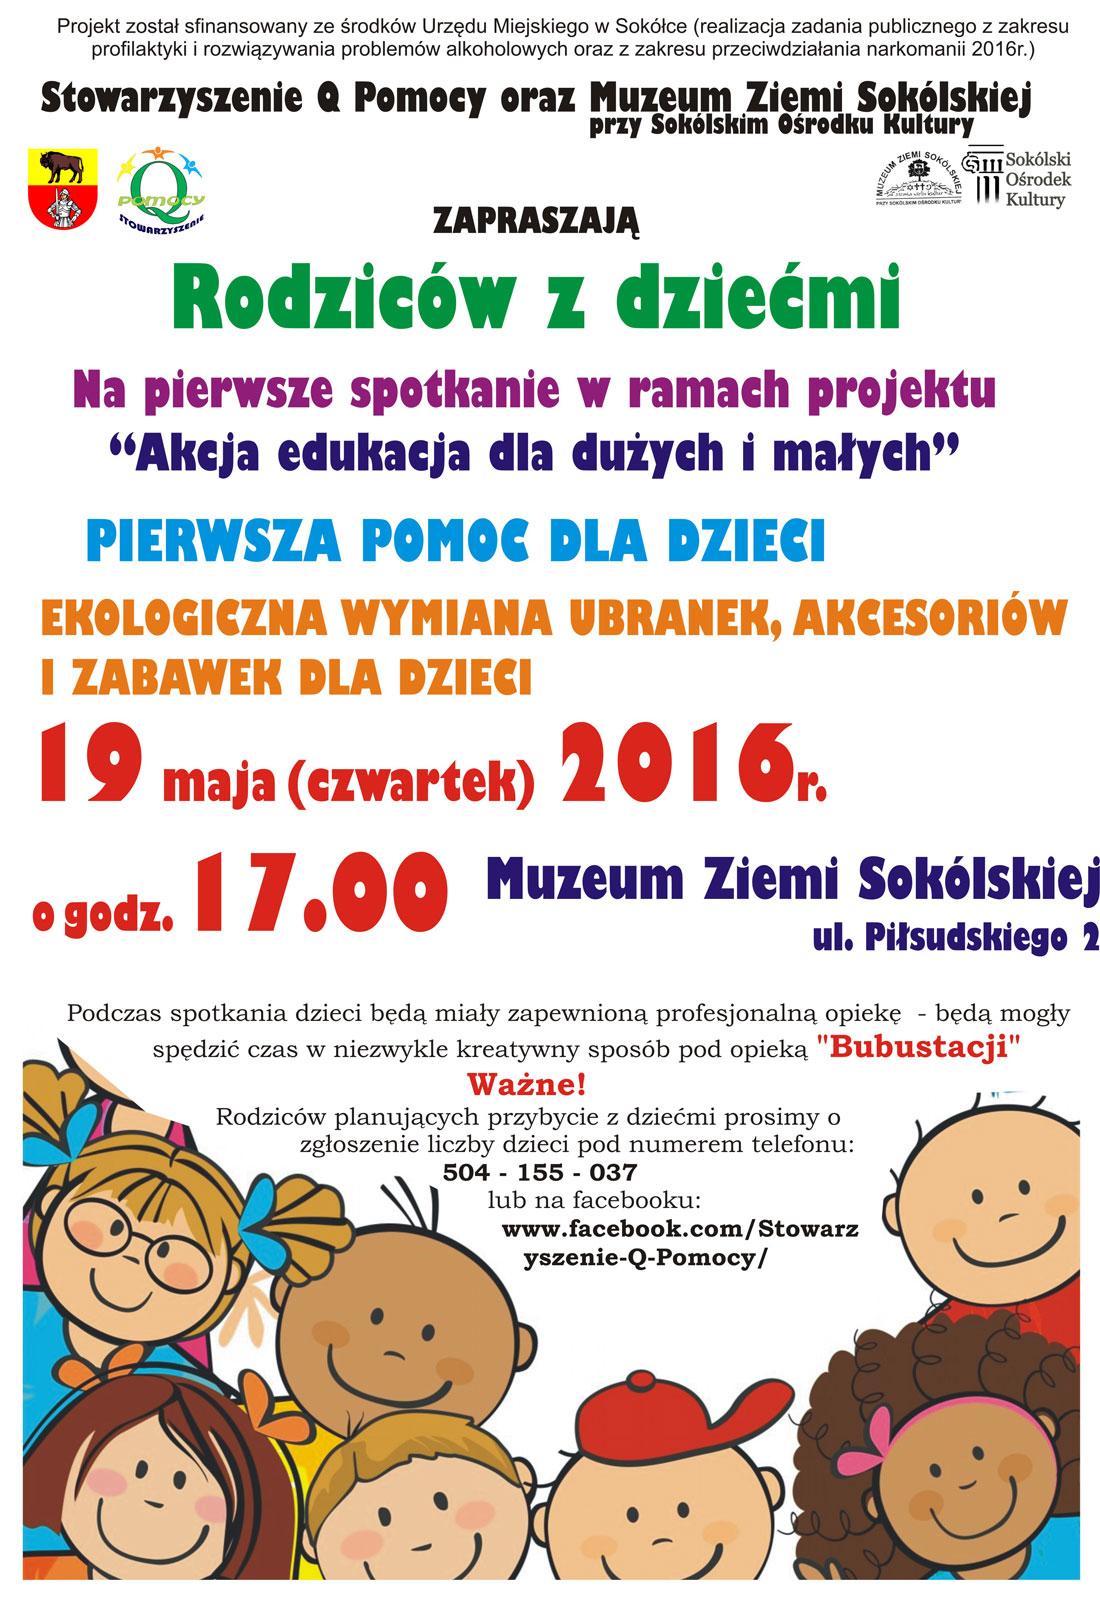 Sokółka Gmina Sokółka 108213 Urząd Miejski W Sokółce